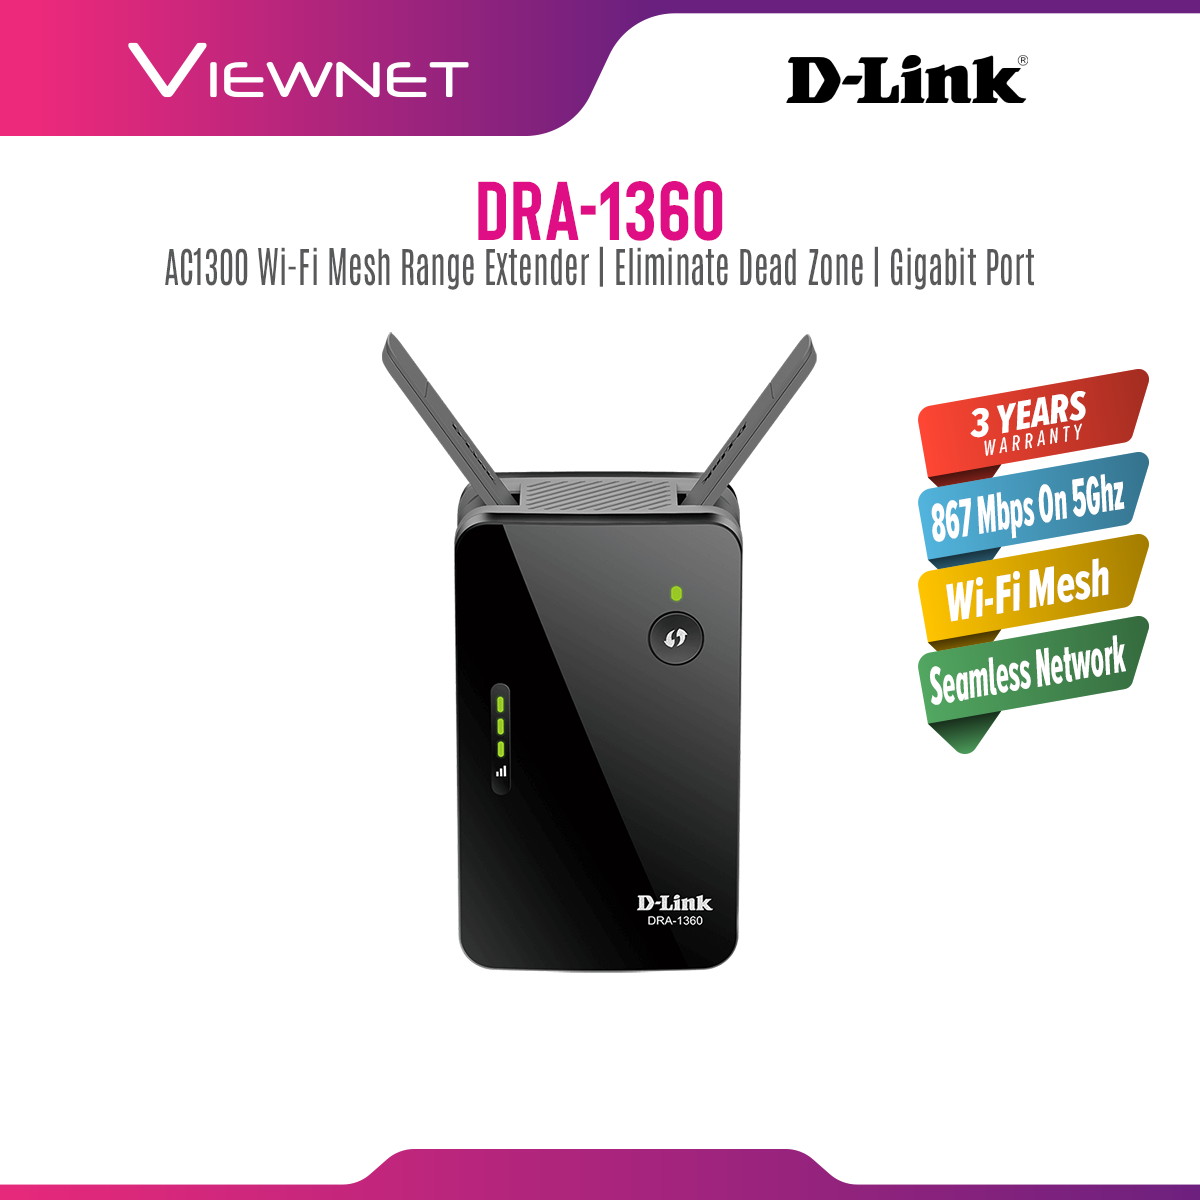 D-Link WiFi Range Extender AC1300 Mesh-Enabled DRA-1360, Gigabit Port, 400Mbps